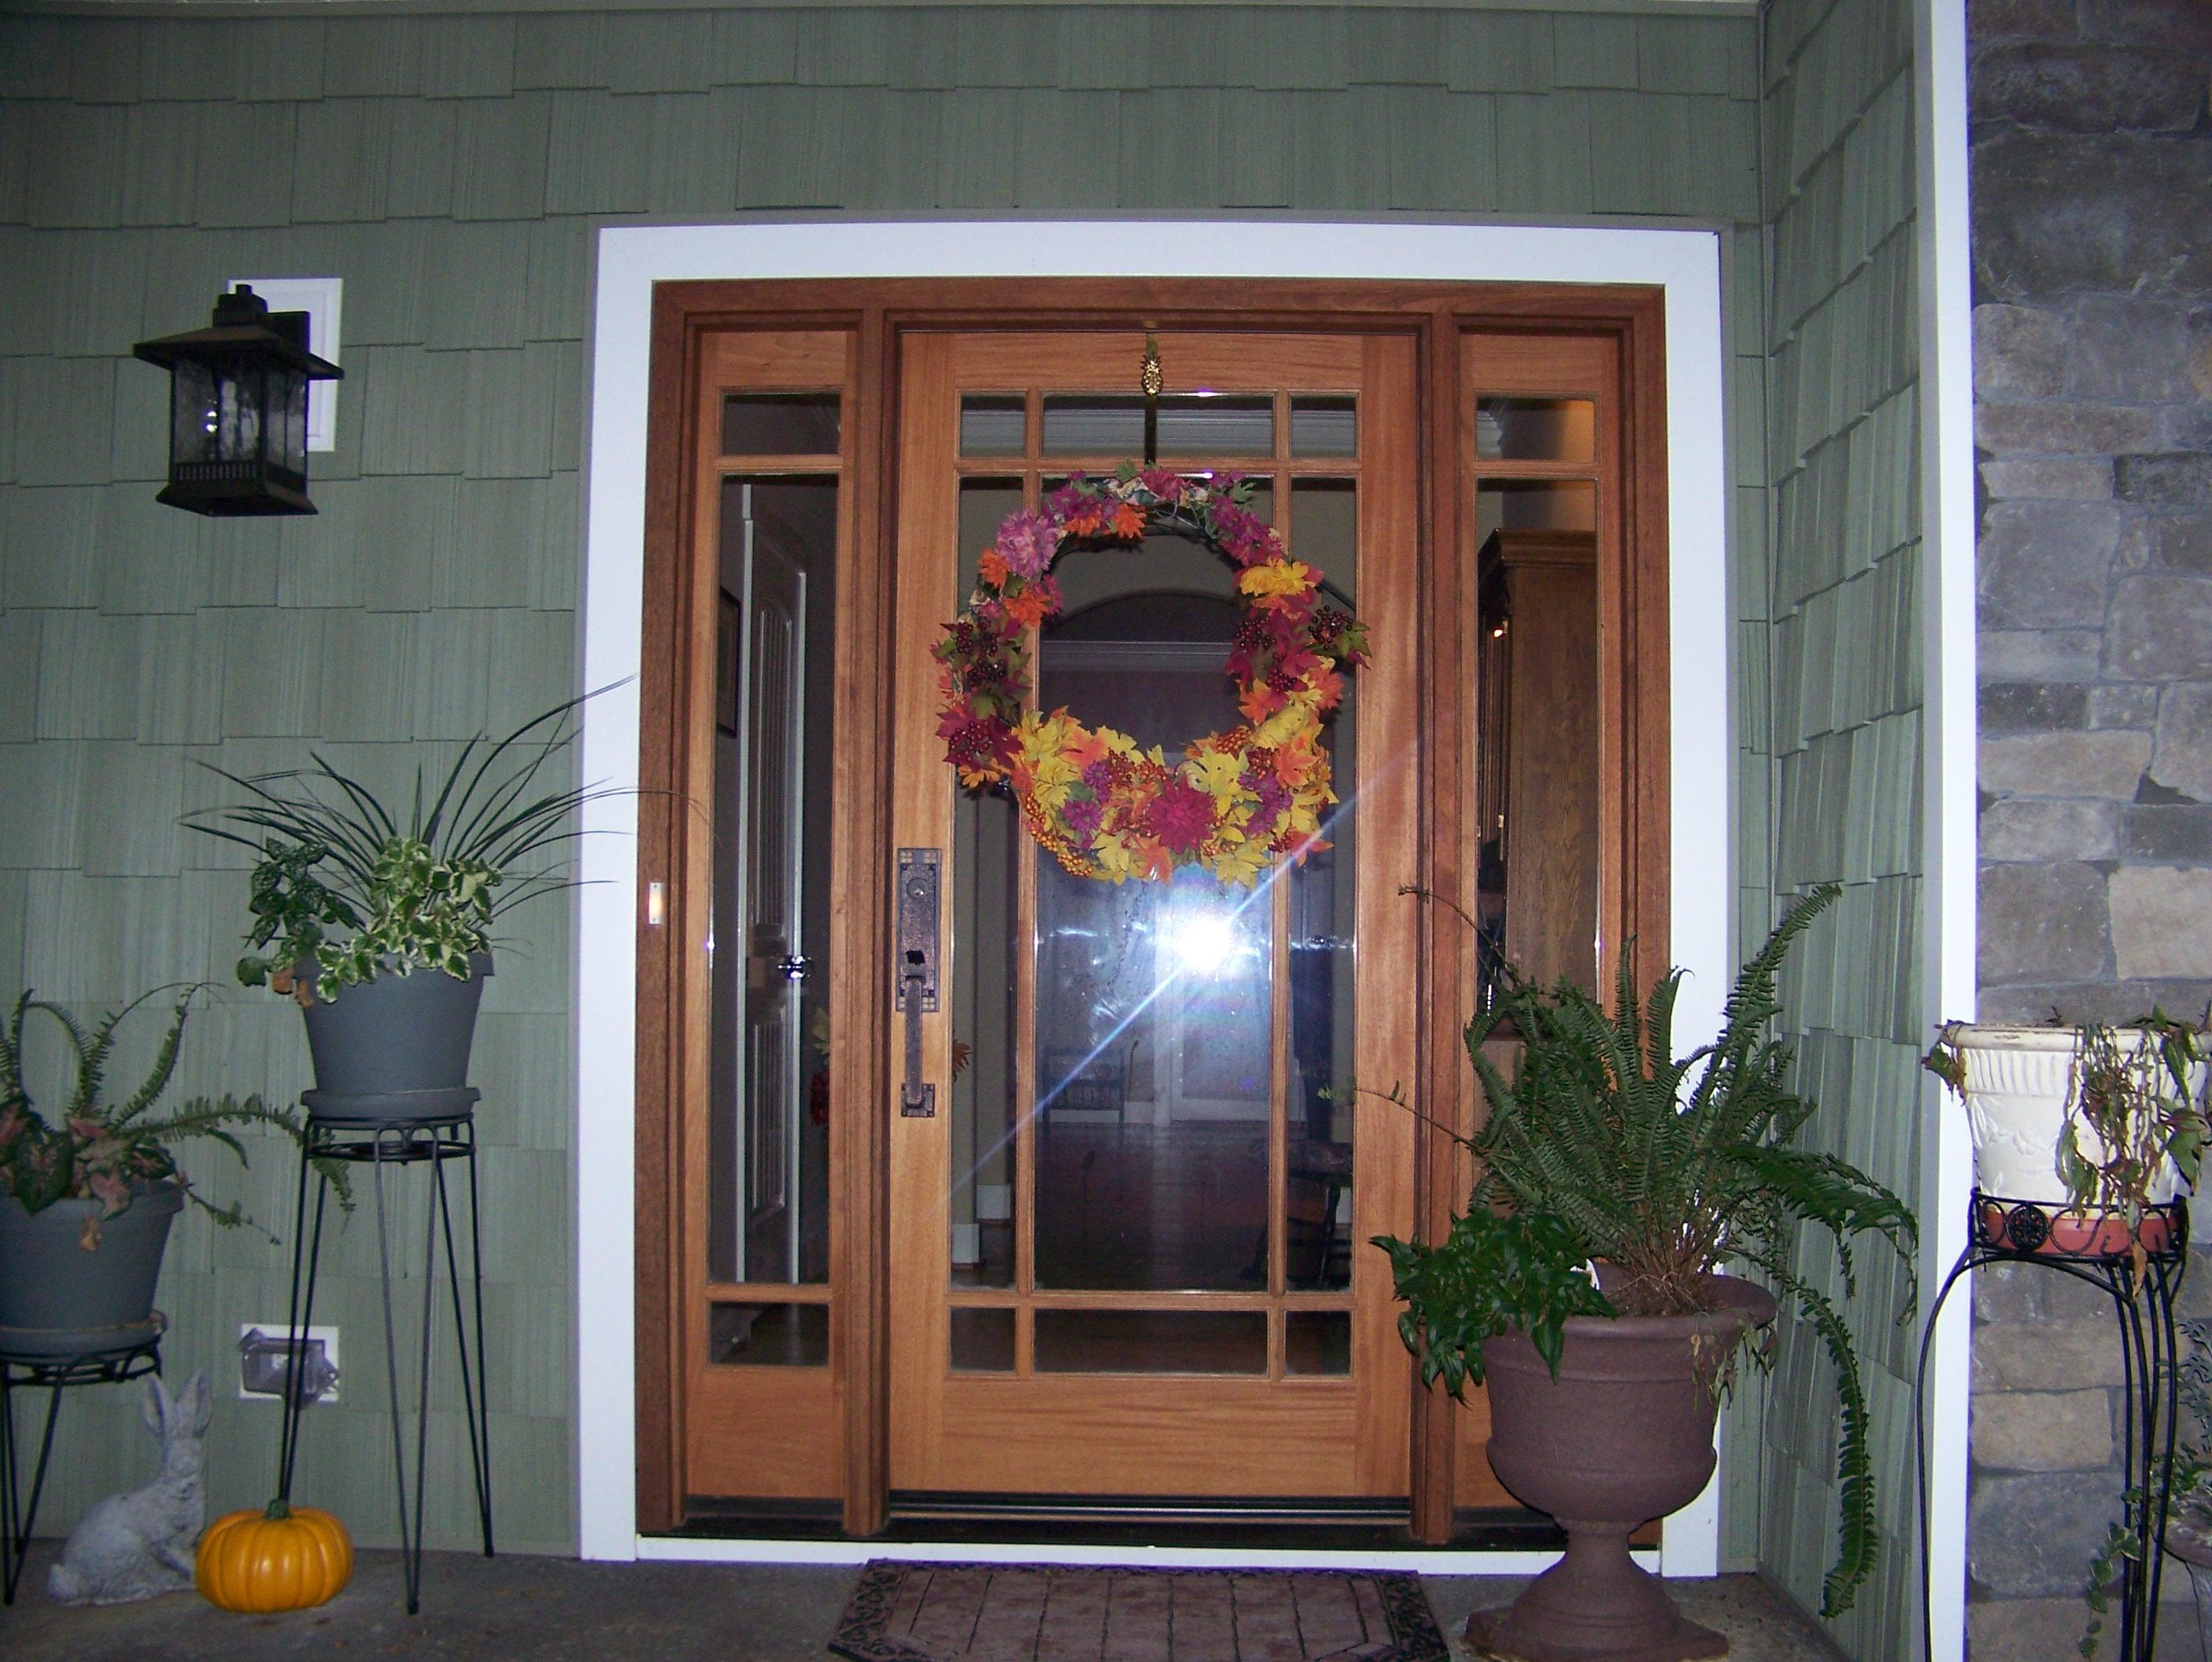 decoration-stunning-front-entry-door-ideas-with-brown-wooden-door-within-inspiration-picturs-of-front-door-design-ideas